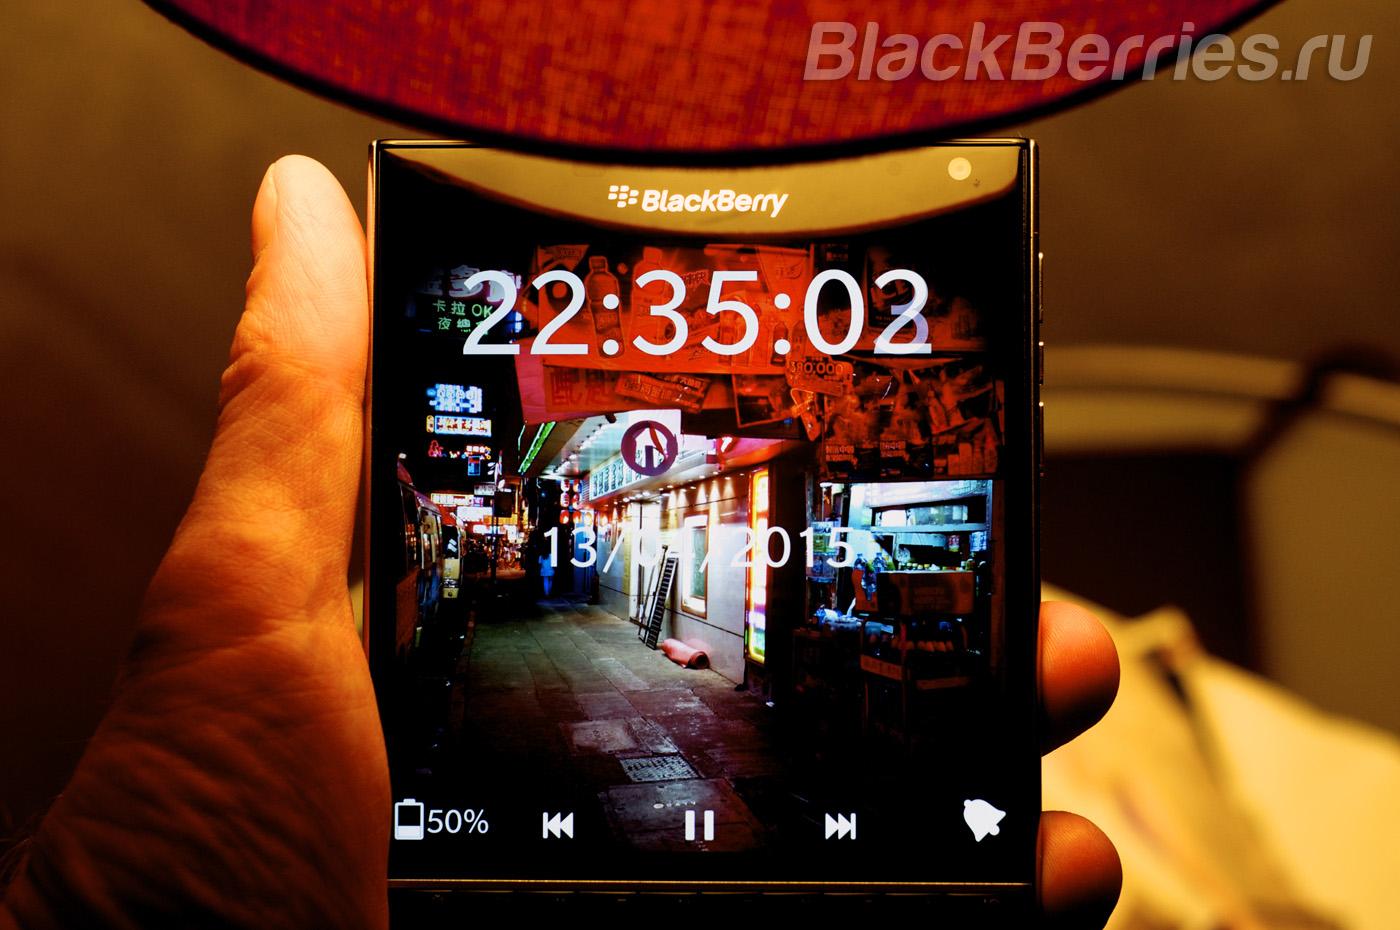 BlackBerry-Passport-Nightly-Clock